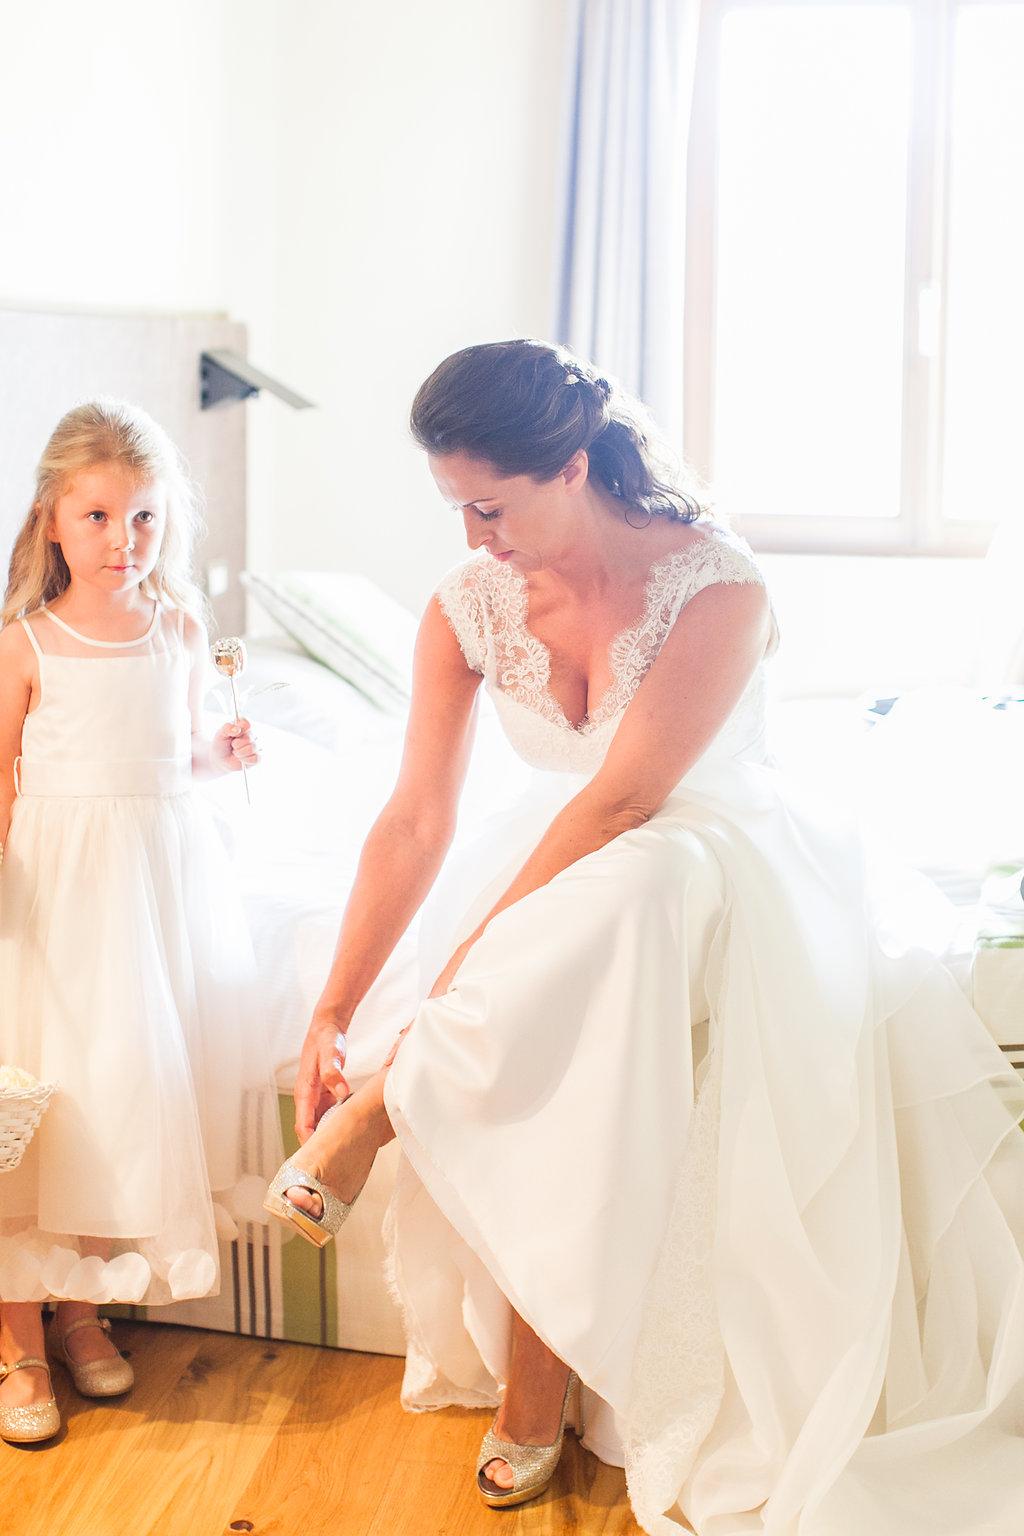 castelfalfi-tuscany-wedding-photographer-roberta-facchini-106